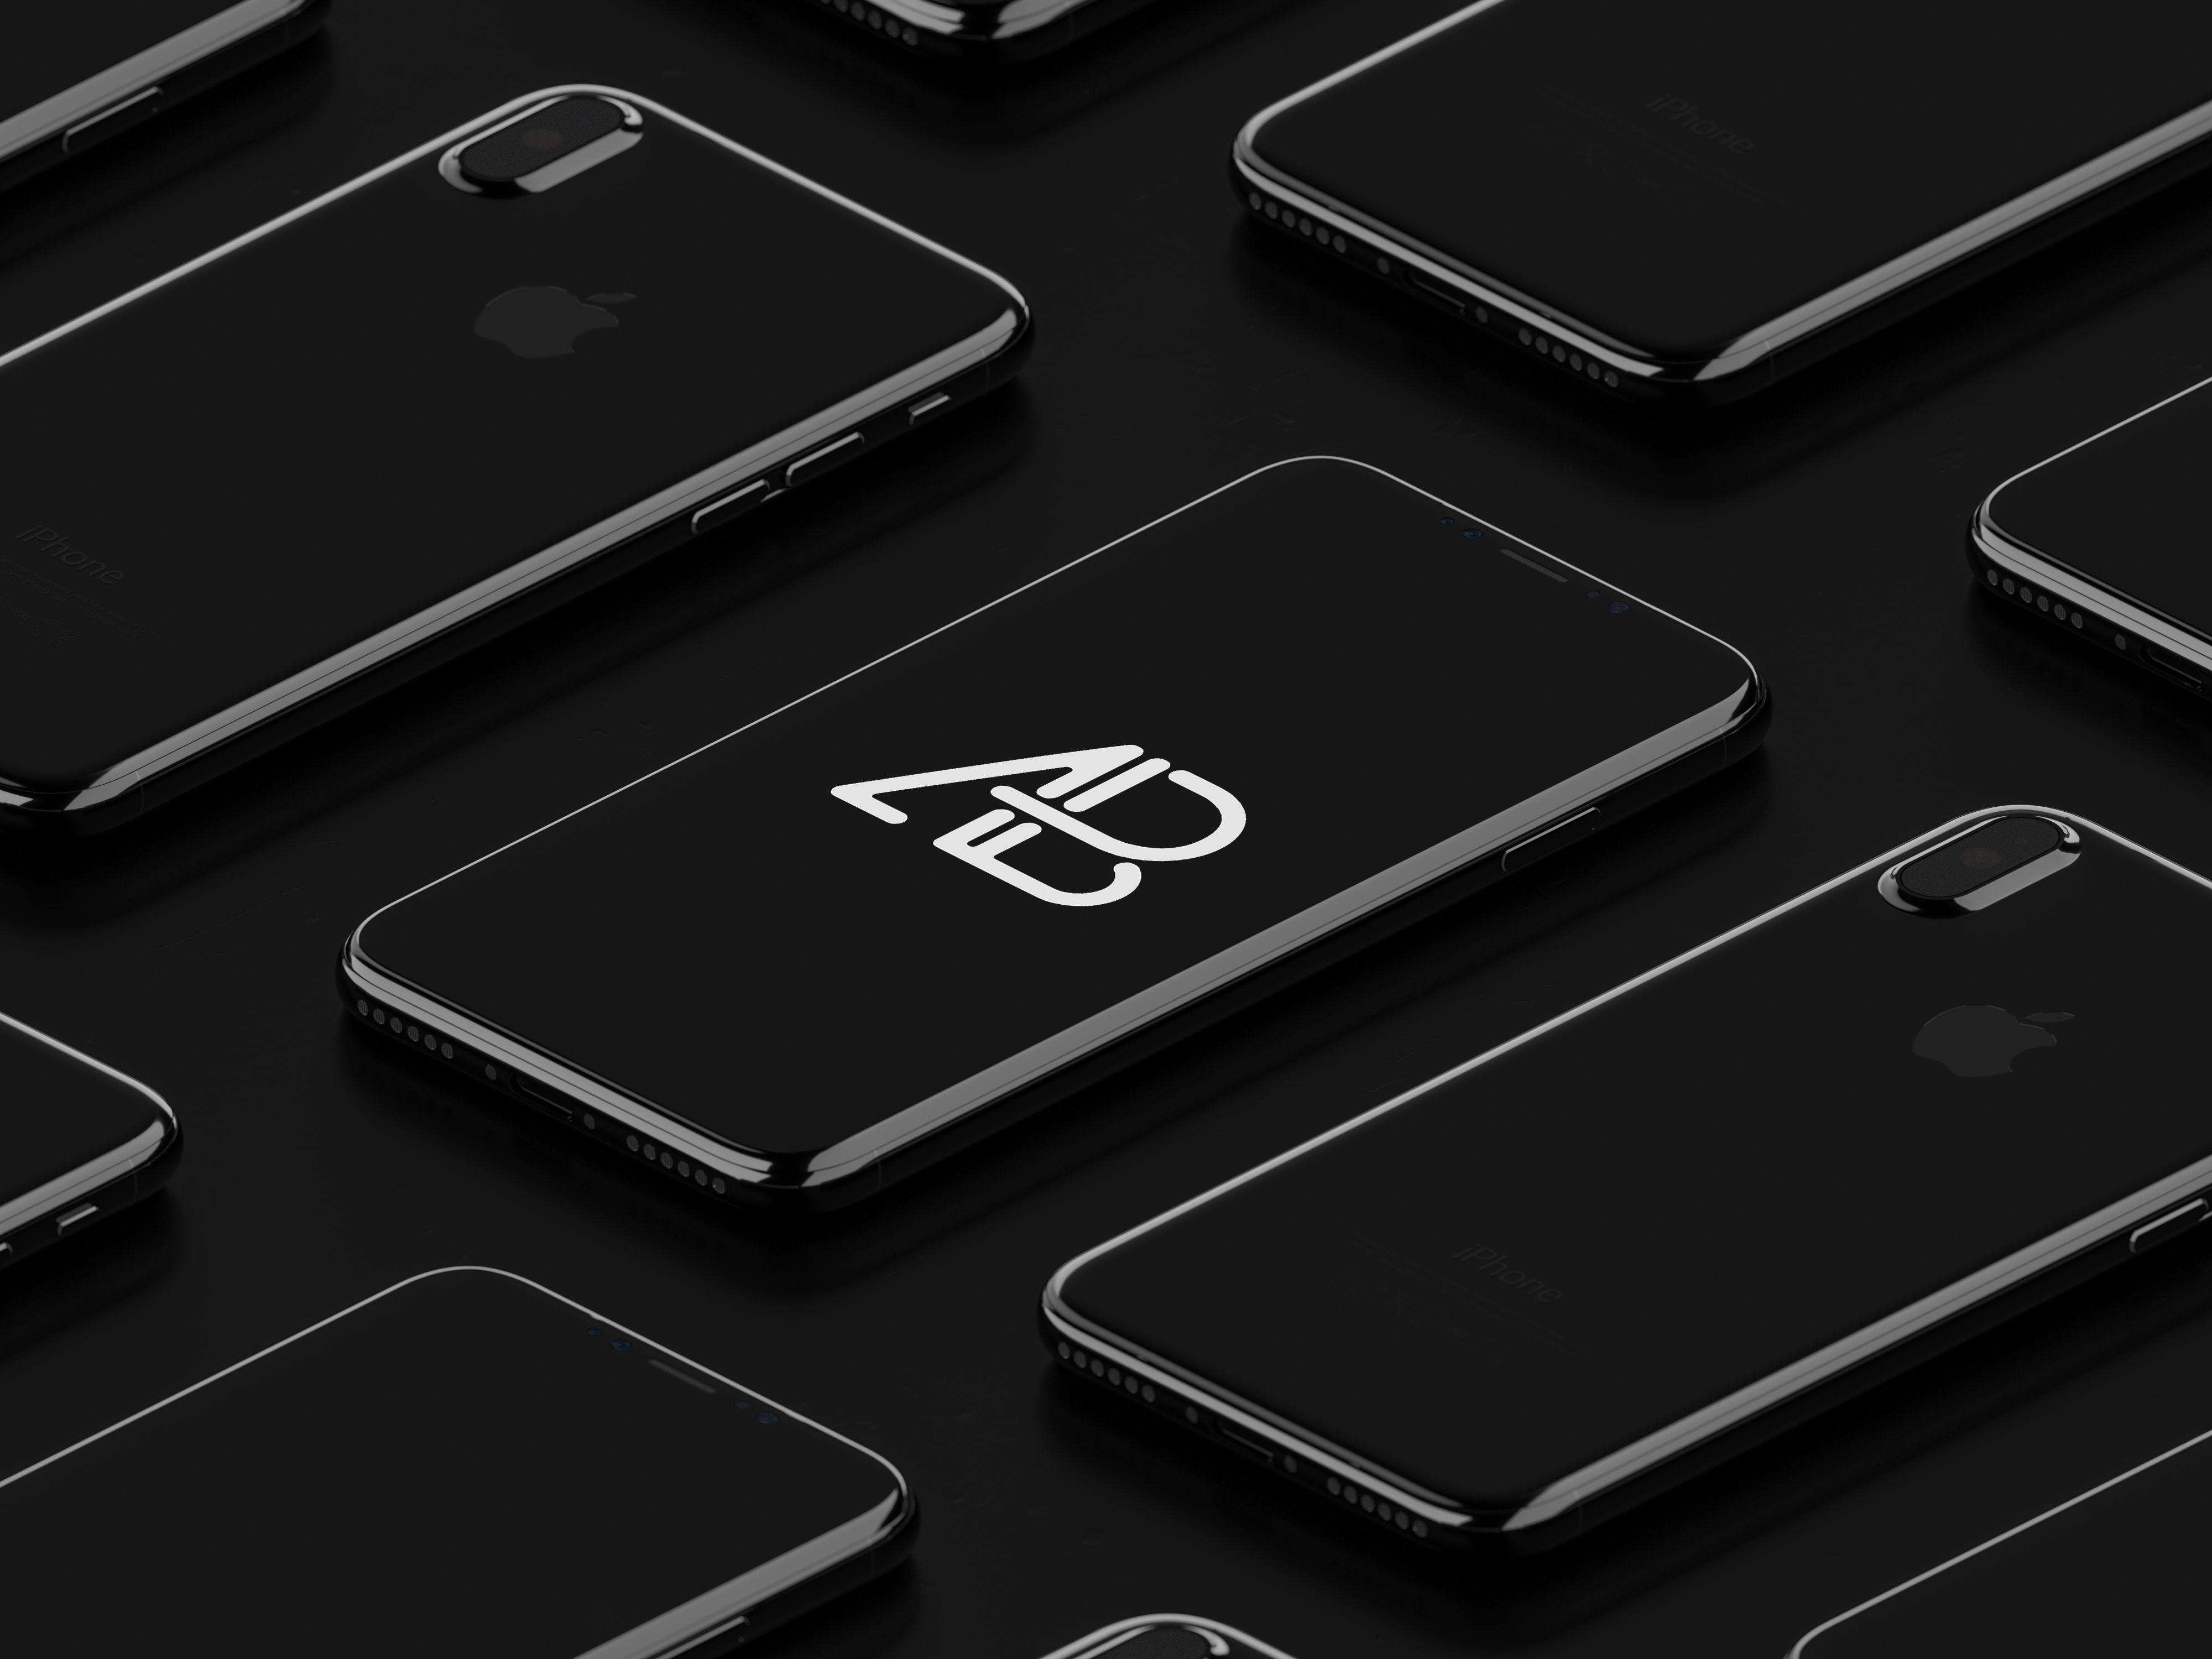 Download Isometric Iphone X Mockup Vol 2 Iphone Iphone Mockup Iphone Psd